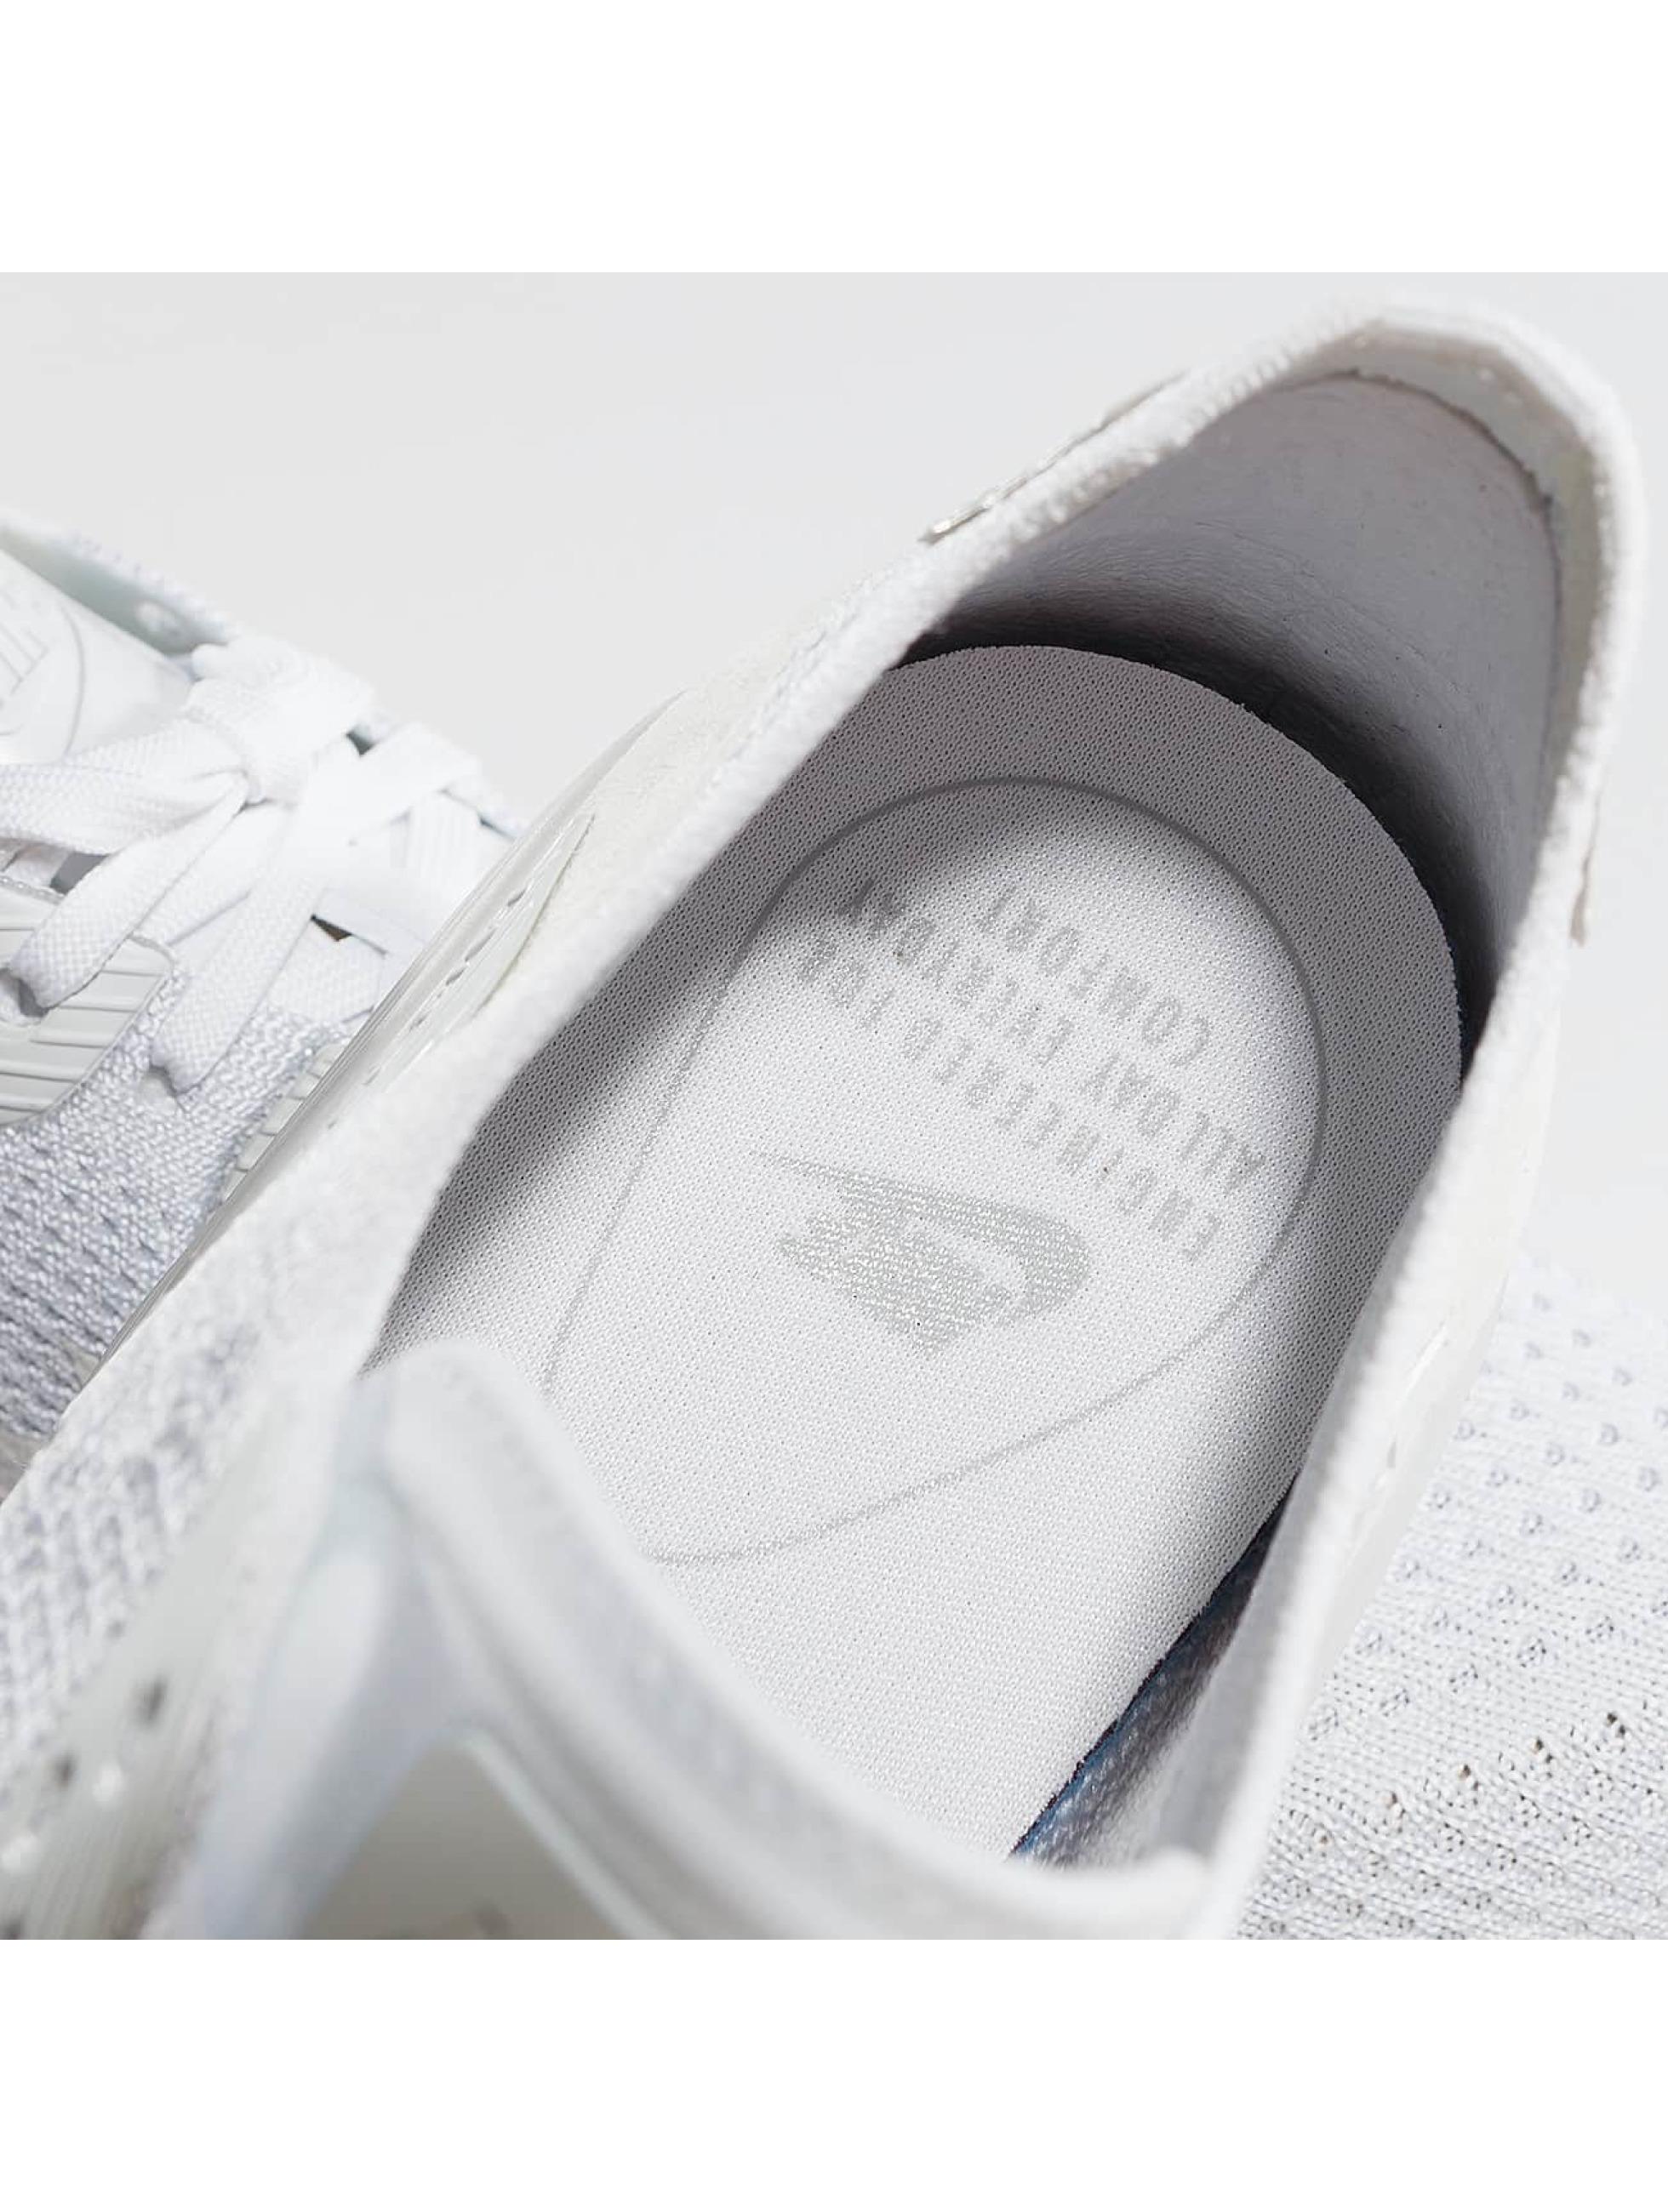 Nike Zapatillas de deporte Air Max 90 Flyknit Ultra 2.0 blanco